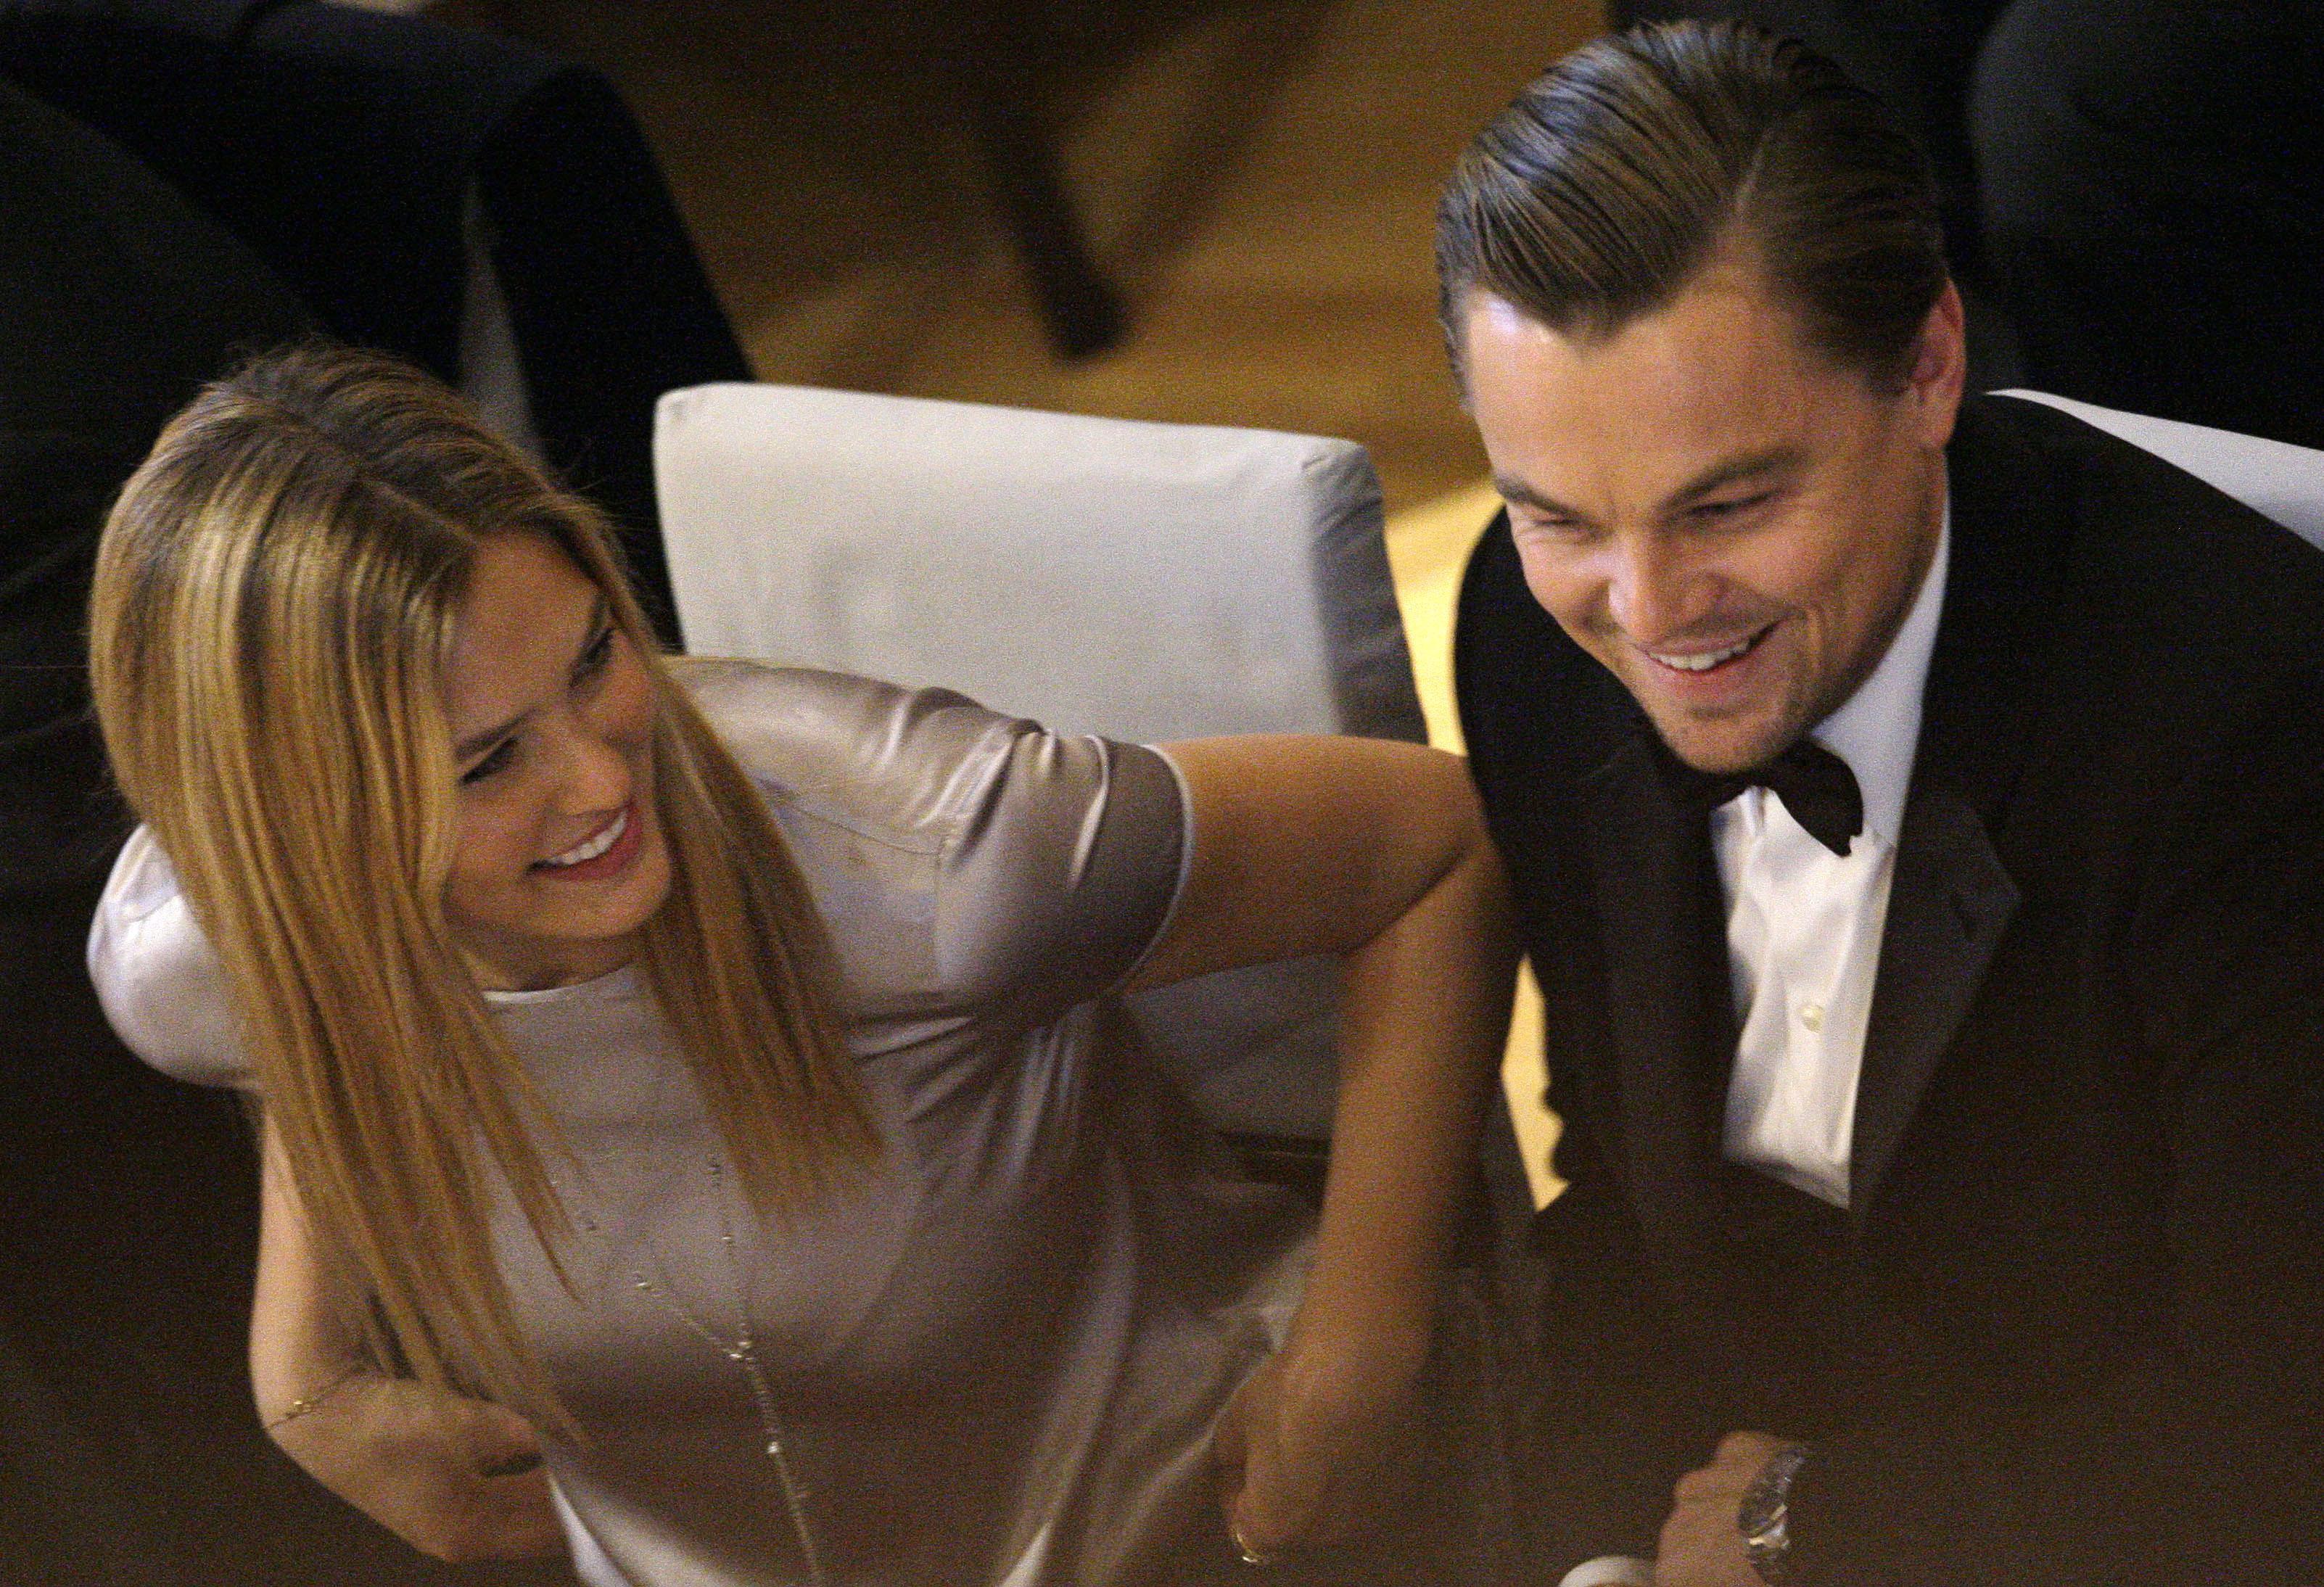 <p>Бар Рафаэли и Леонардо Ди Каприо. Фото: © AP Photo/Joel Ryan</p>